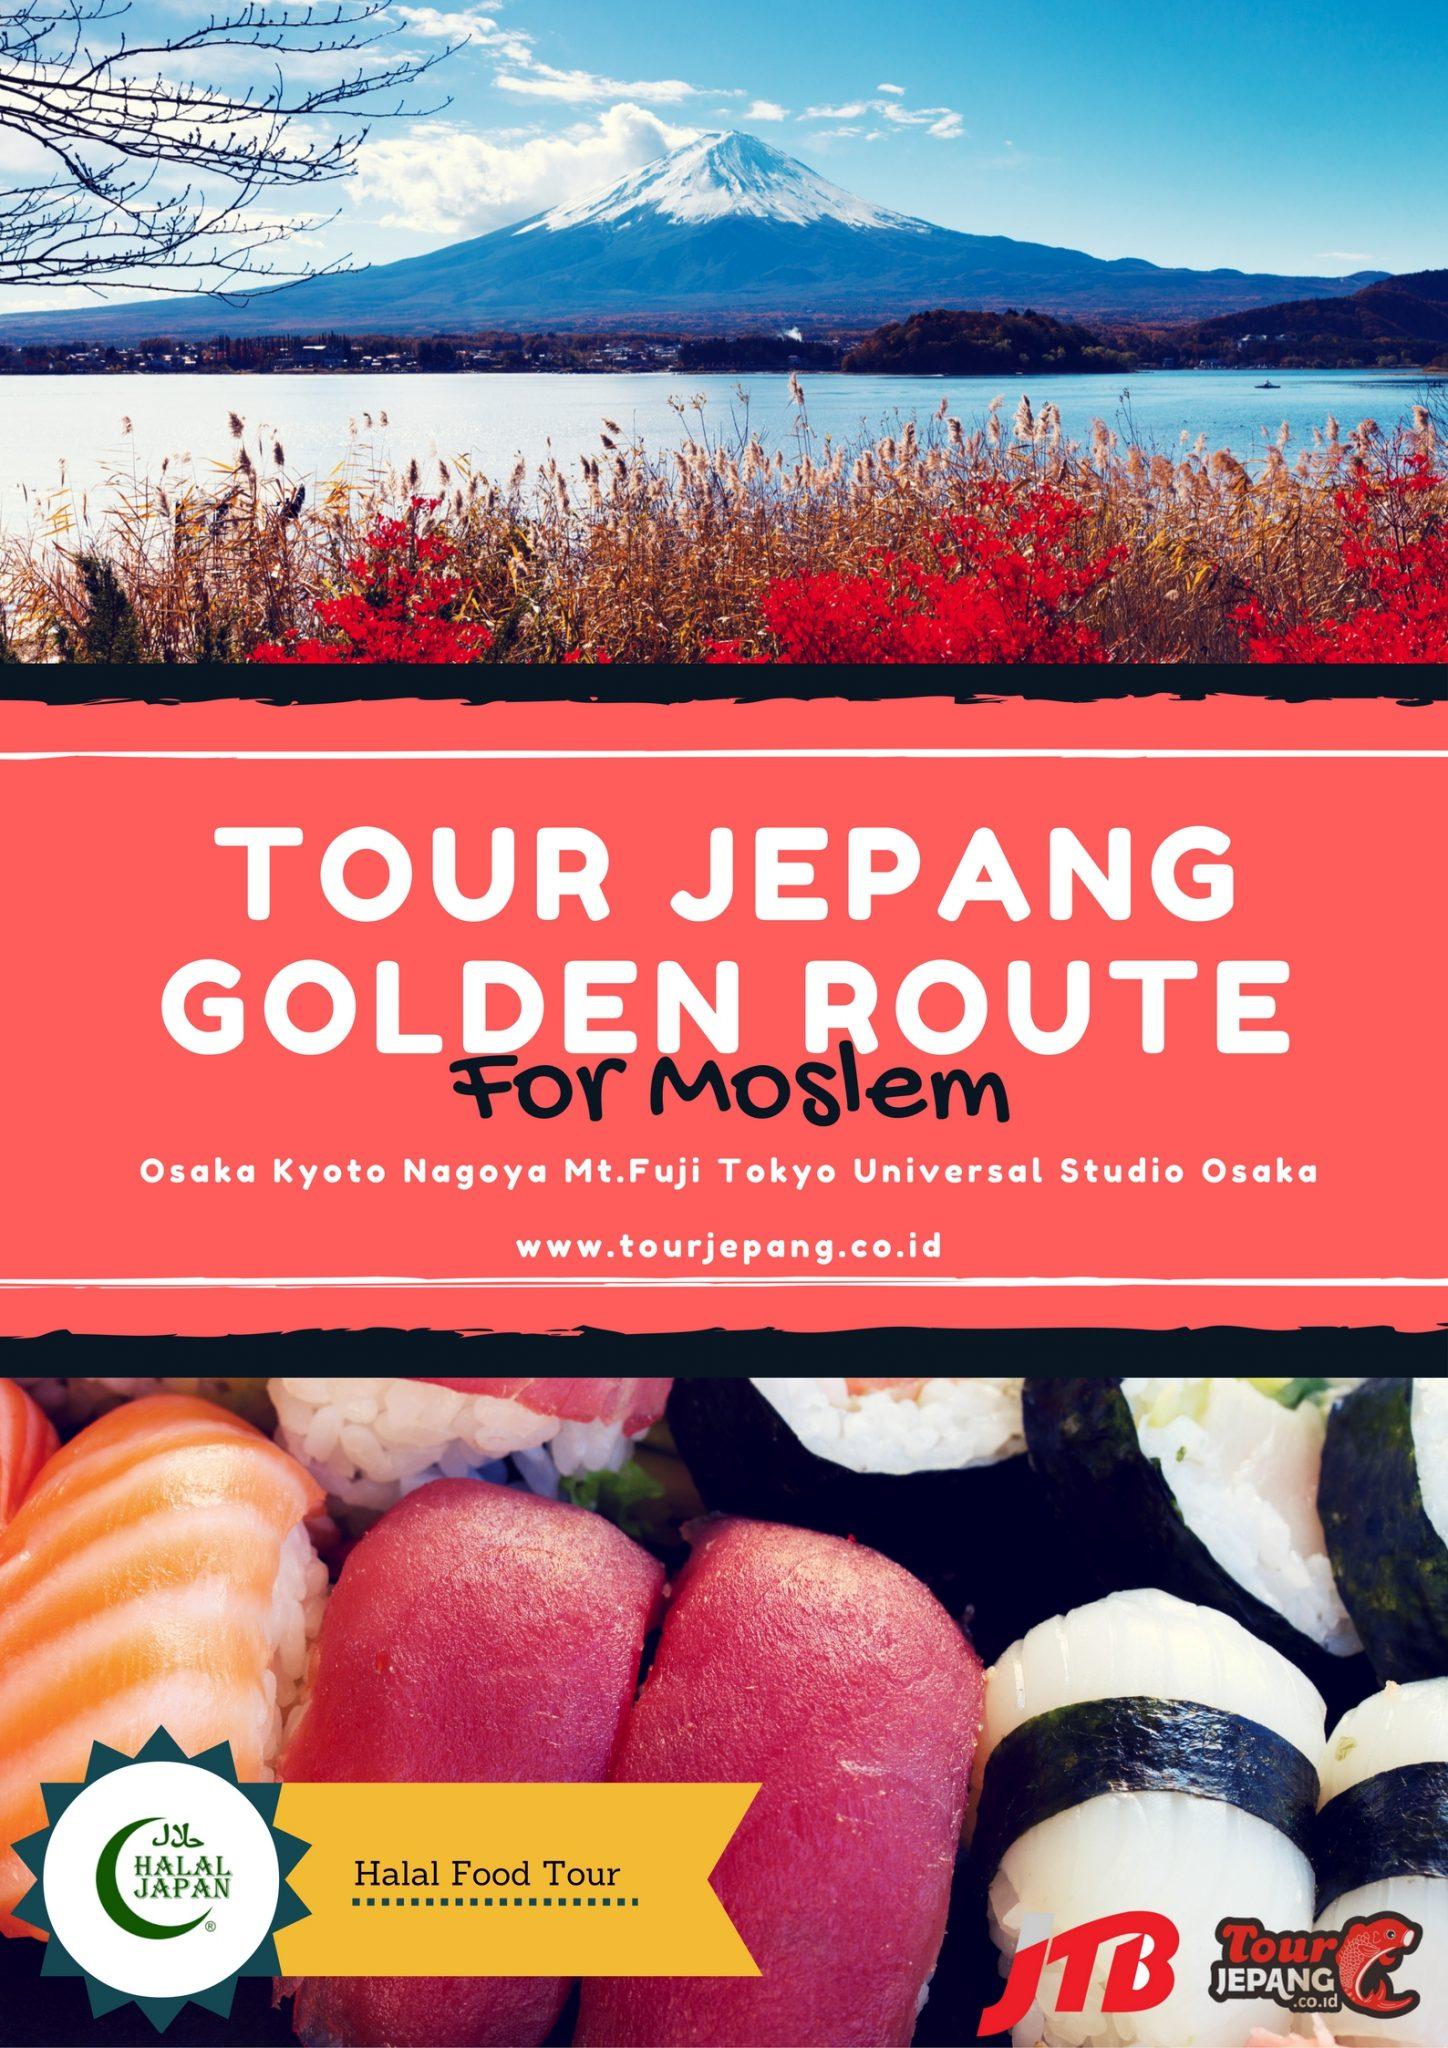 paket-tour-jepang-muslim-golden-route-murah-2016